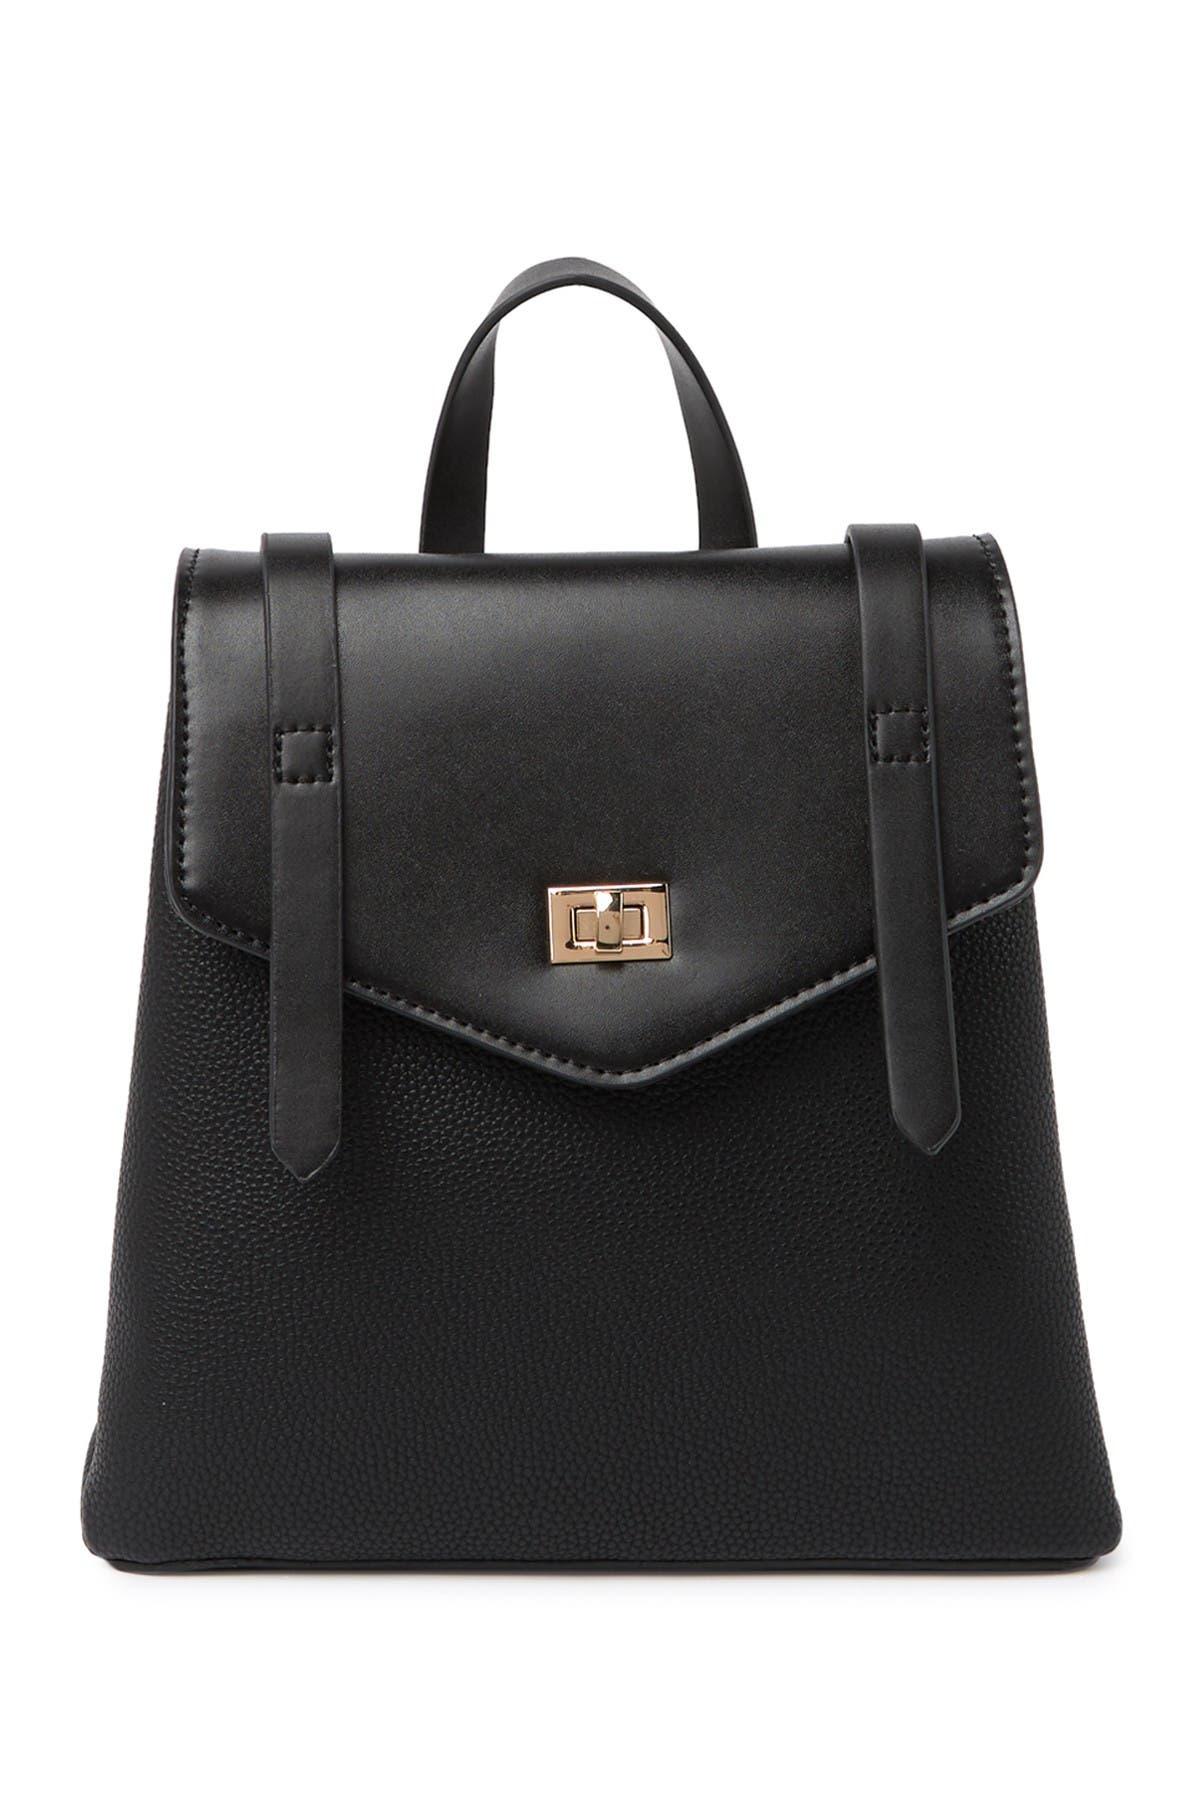 Image of Melie Bianco Maxine Backpack